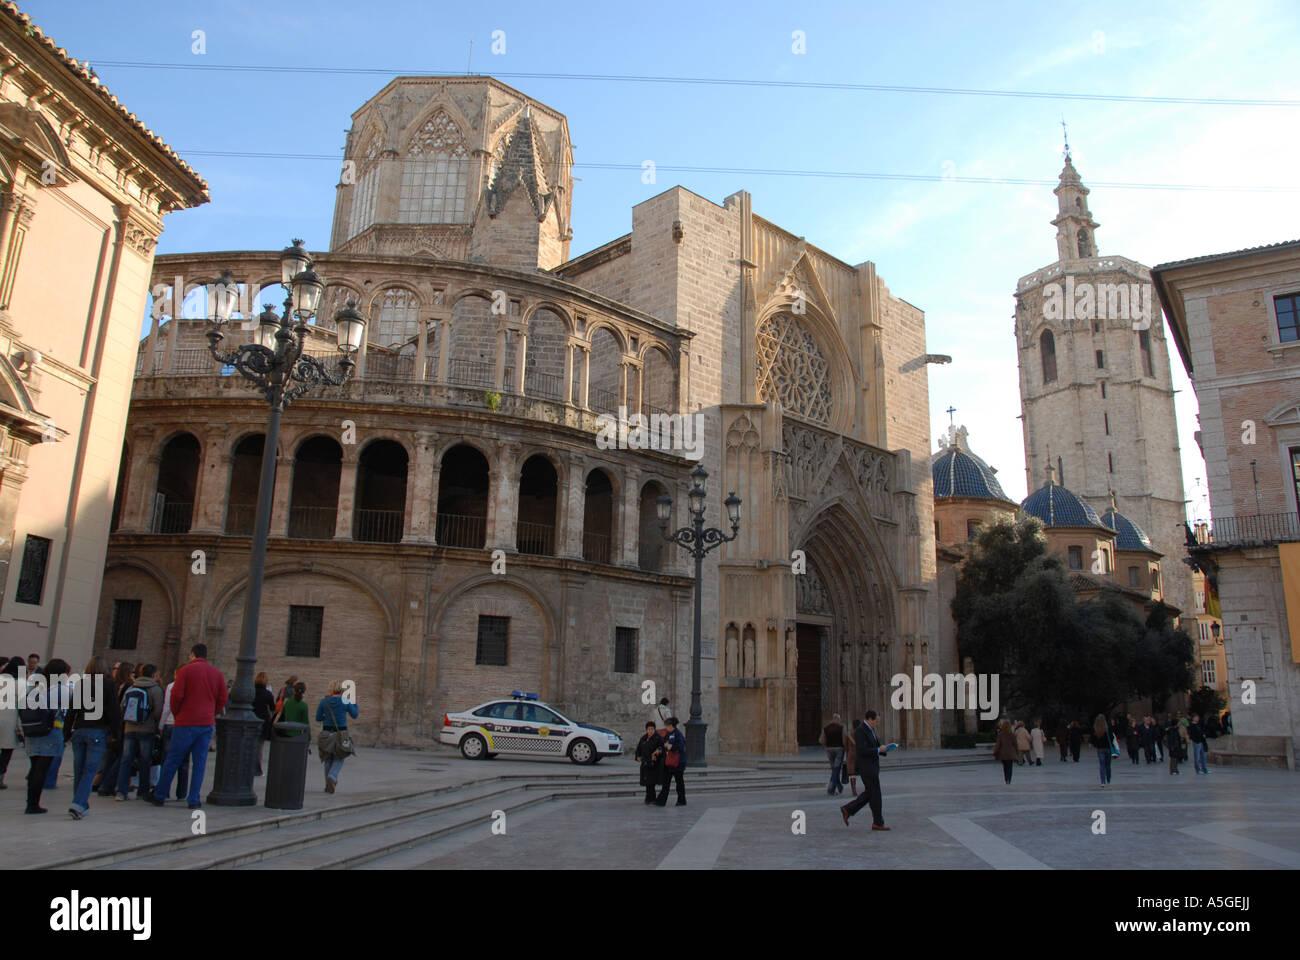 Plaza De La Virgen is a popular tourist haunt in the old quarter close to Valencia Cathedral , Valencia, Spain Stock Photo